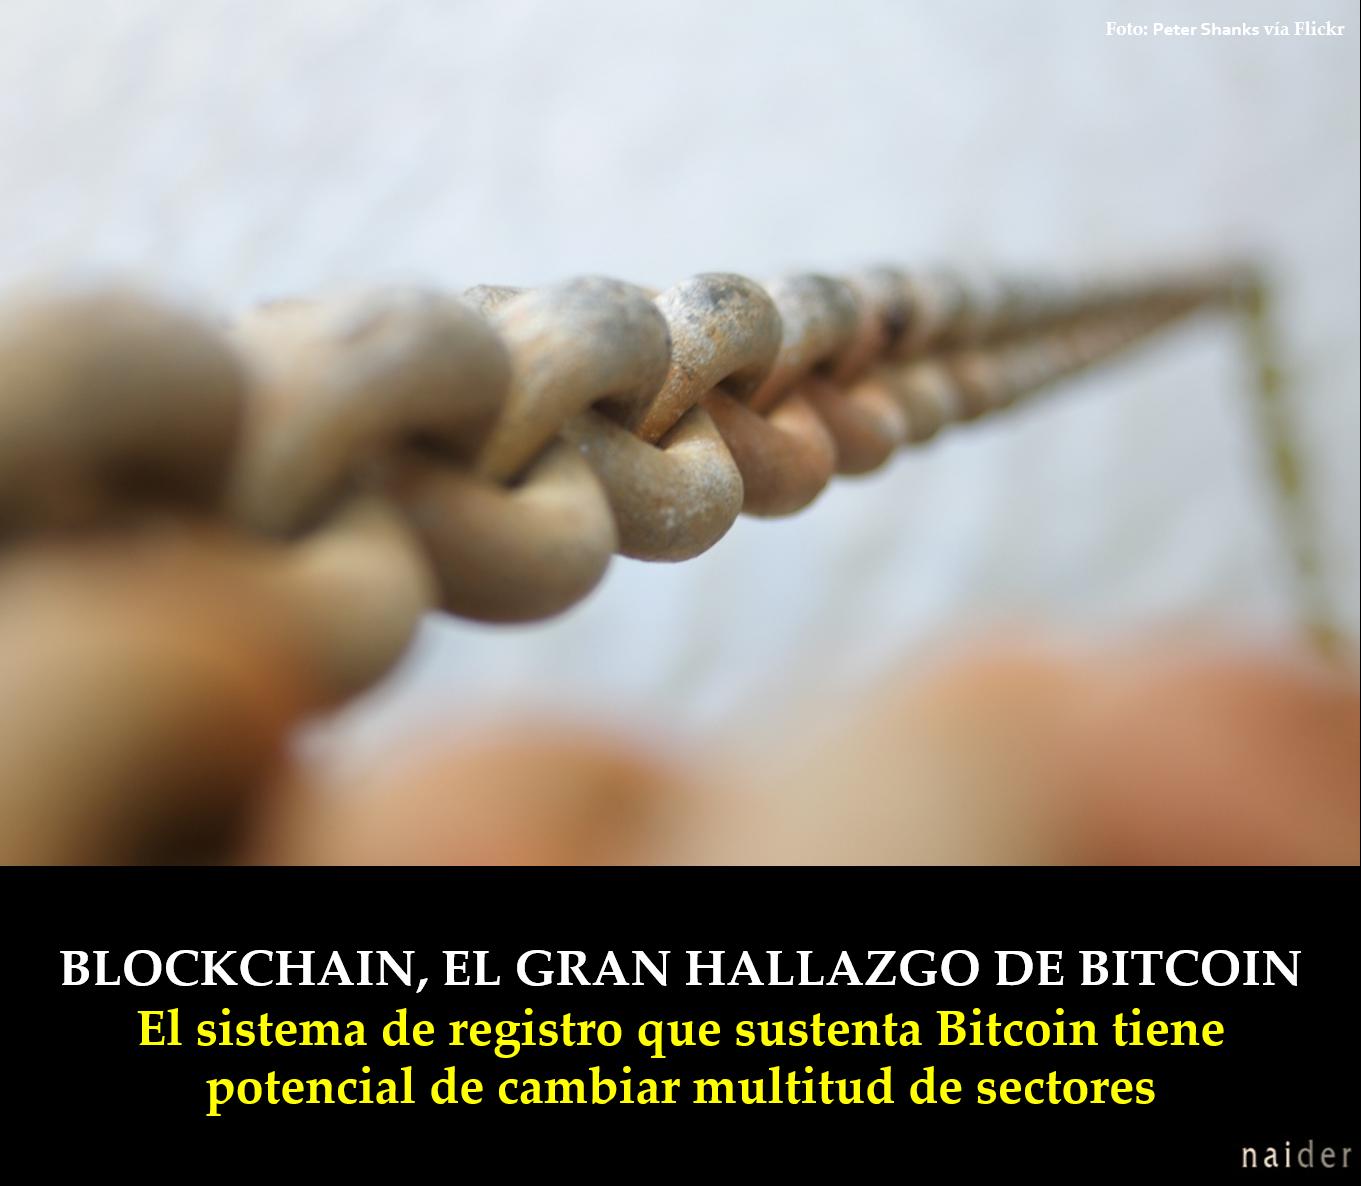 Blockchain, el gran hallazgo de Bitcoin infopost